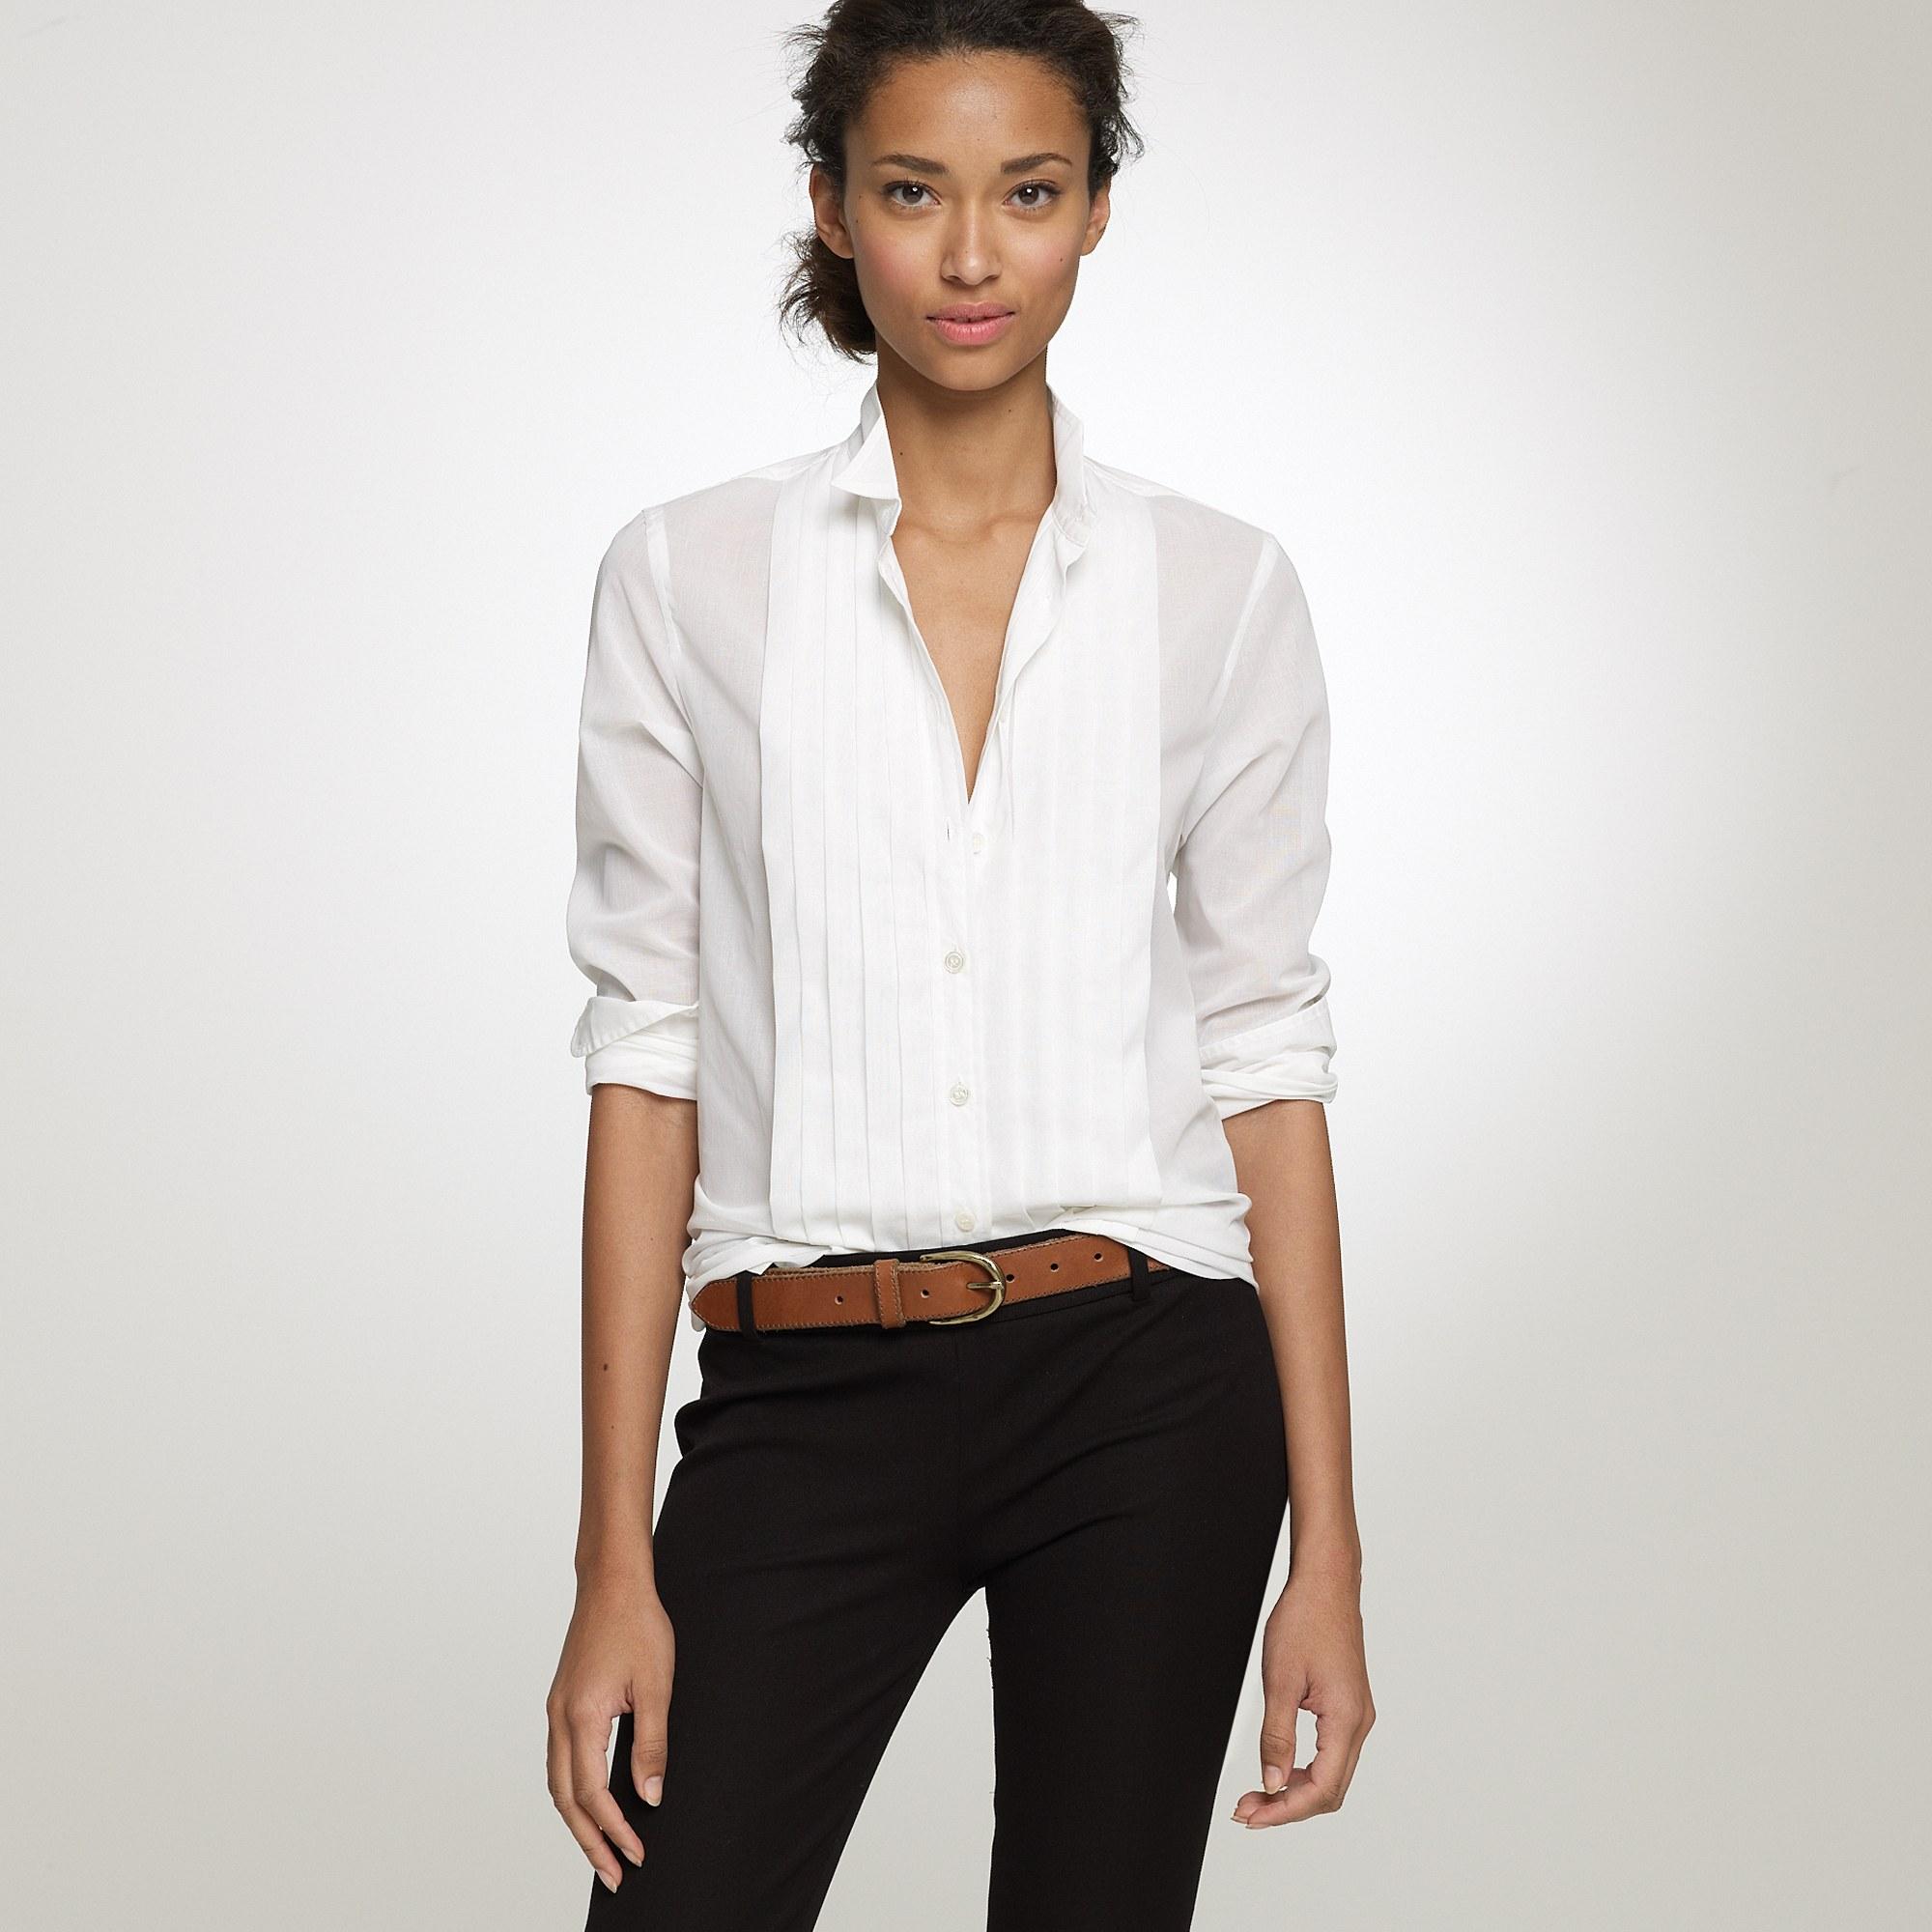 Lyst - J.Crew Tuxedo Shirt in Thomas Mason® Fabric in White cd5f9f16f